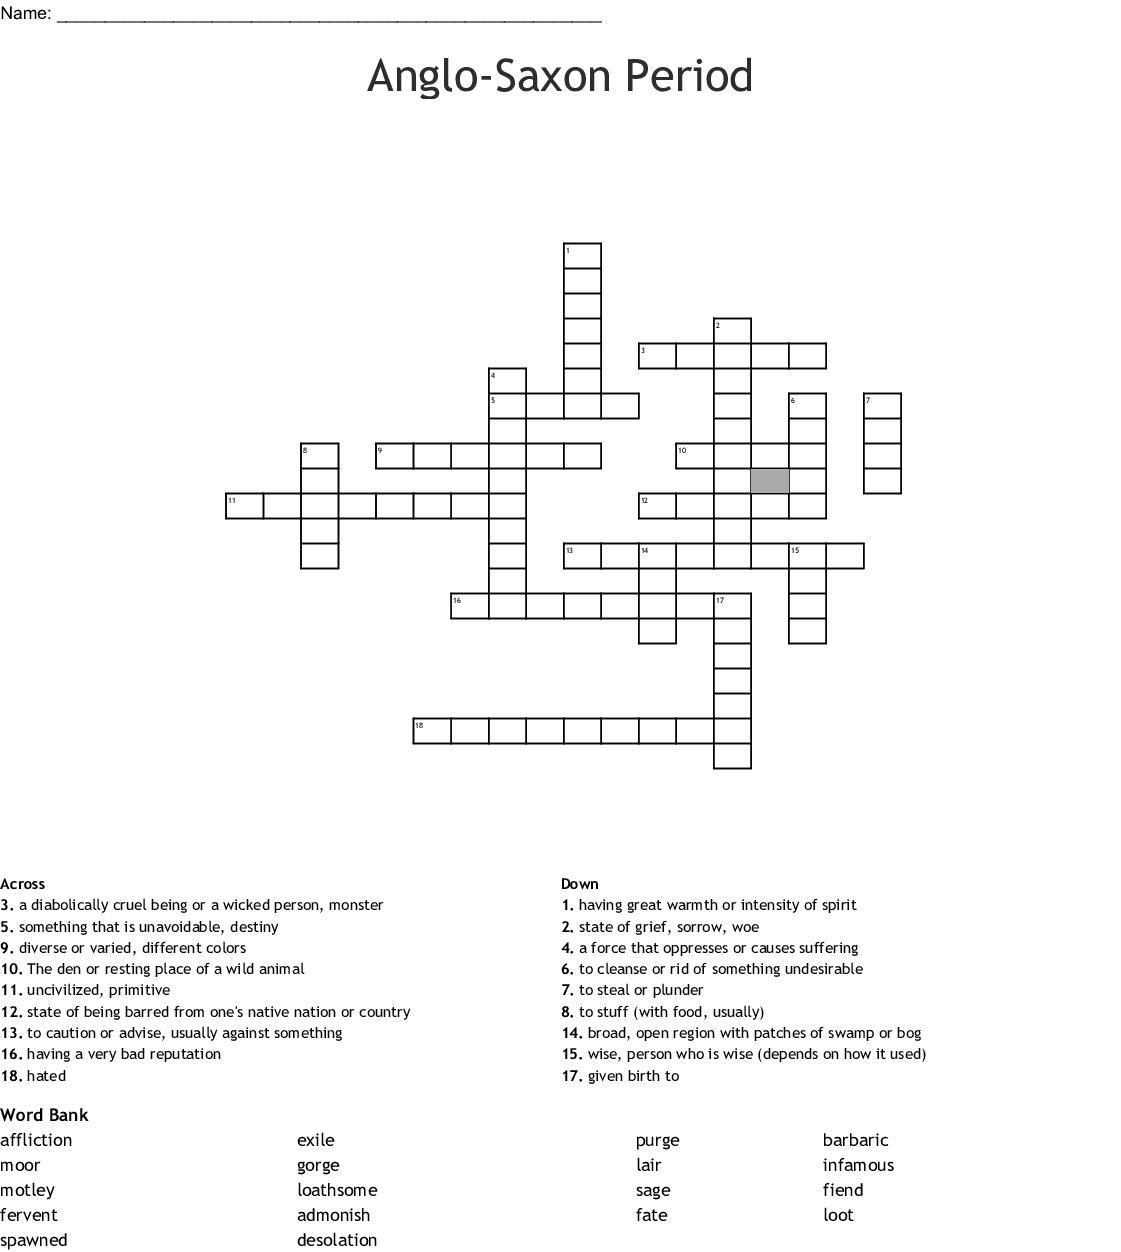 Anglo Saxon Period Crossword Wordmint